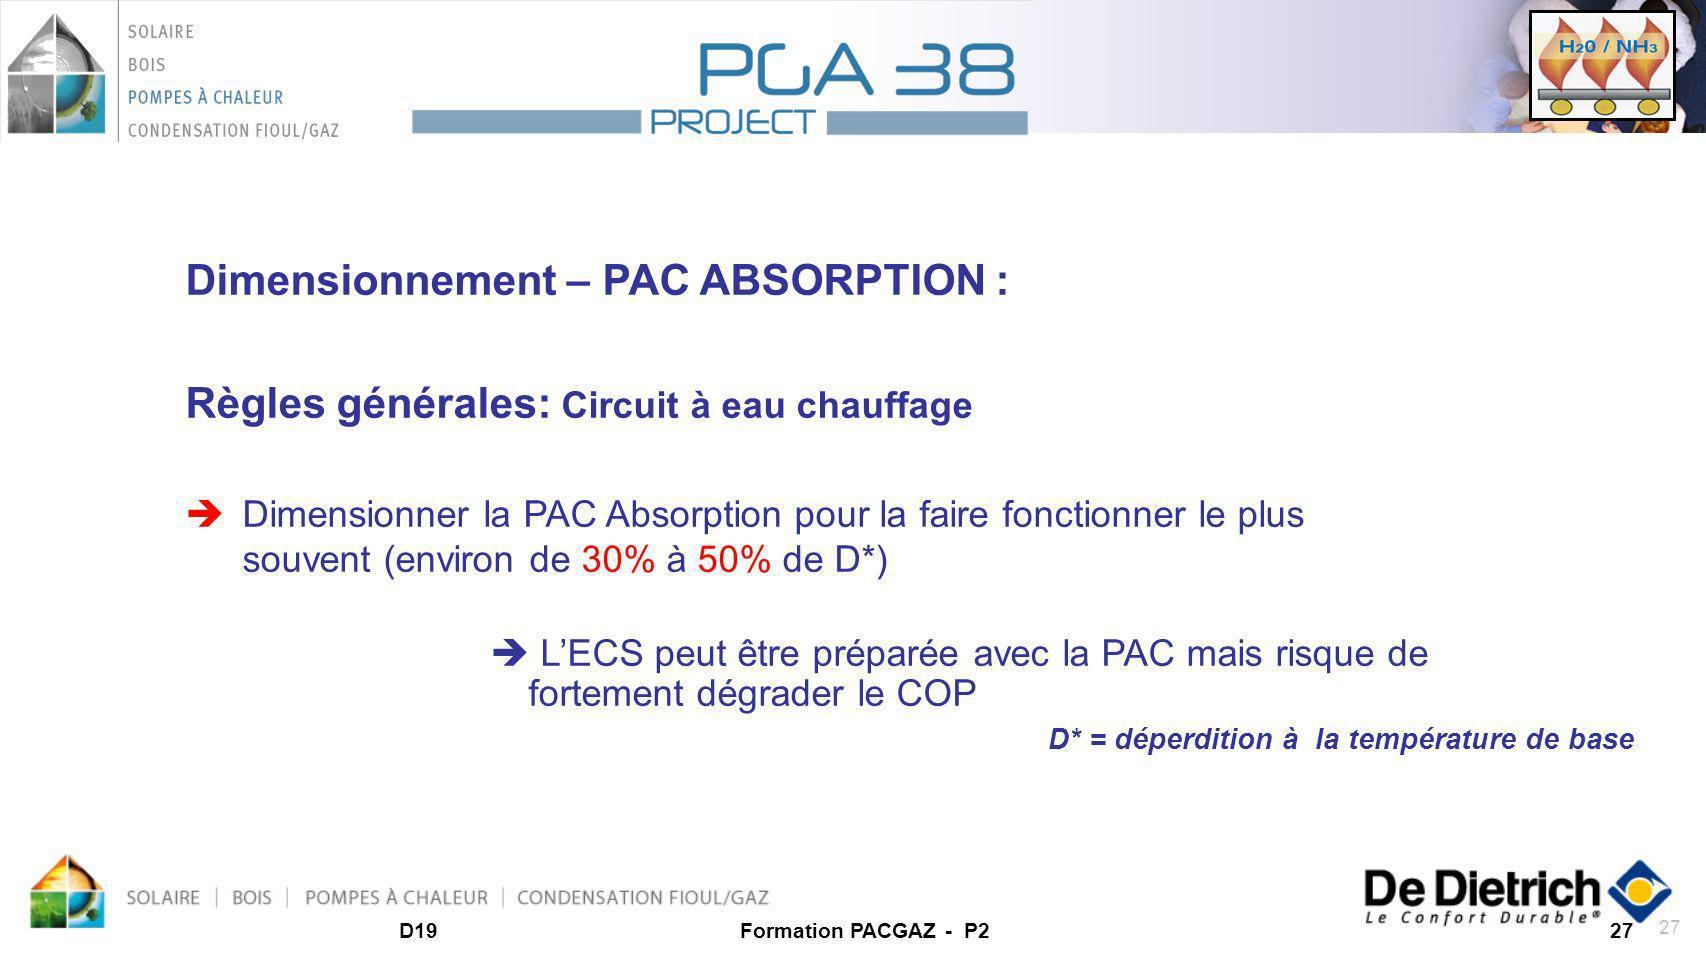 Dimensionnement – PAC ABSORPTION :